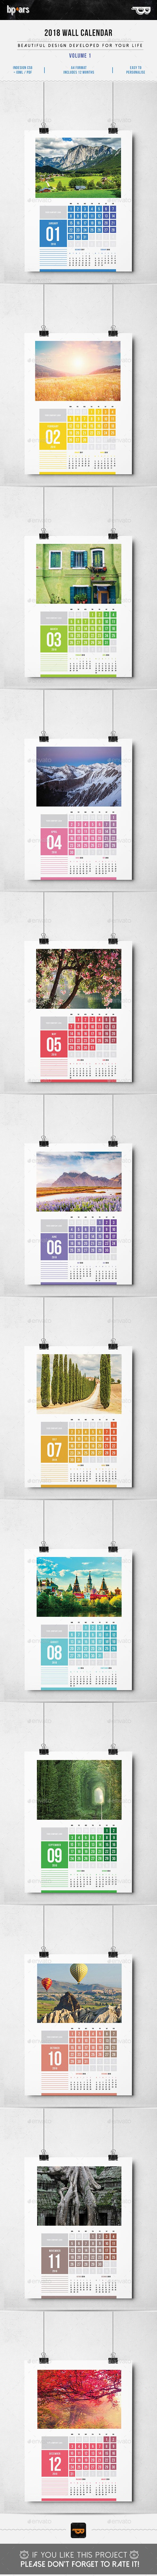 Calendars 2018 vol I | Poster Calendars Template PSD